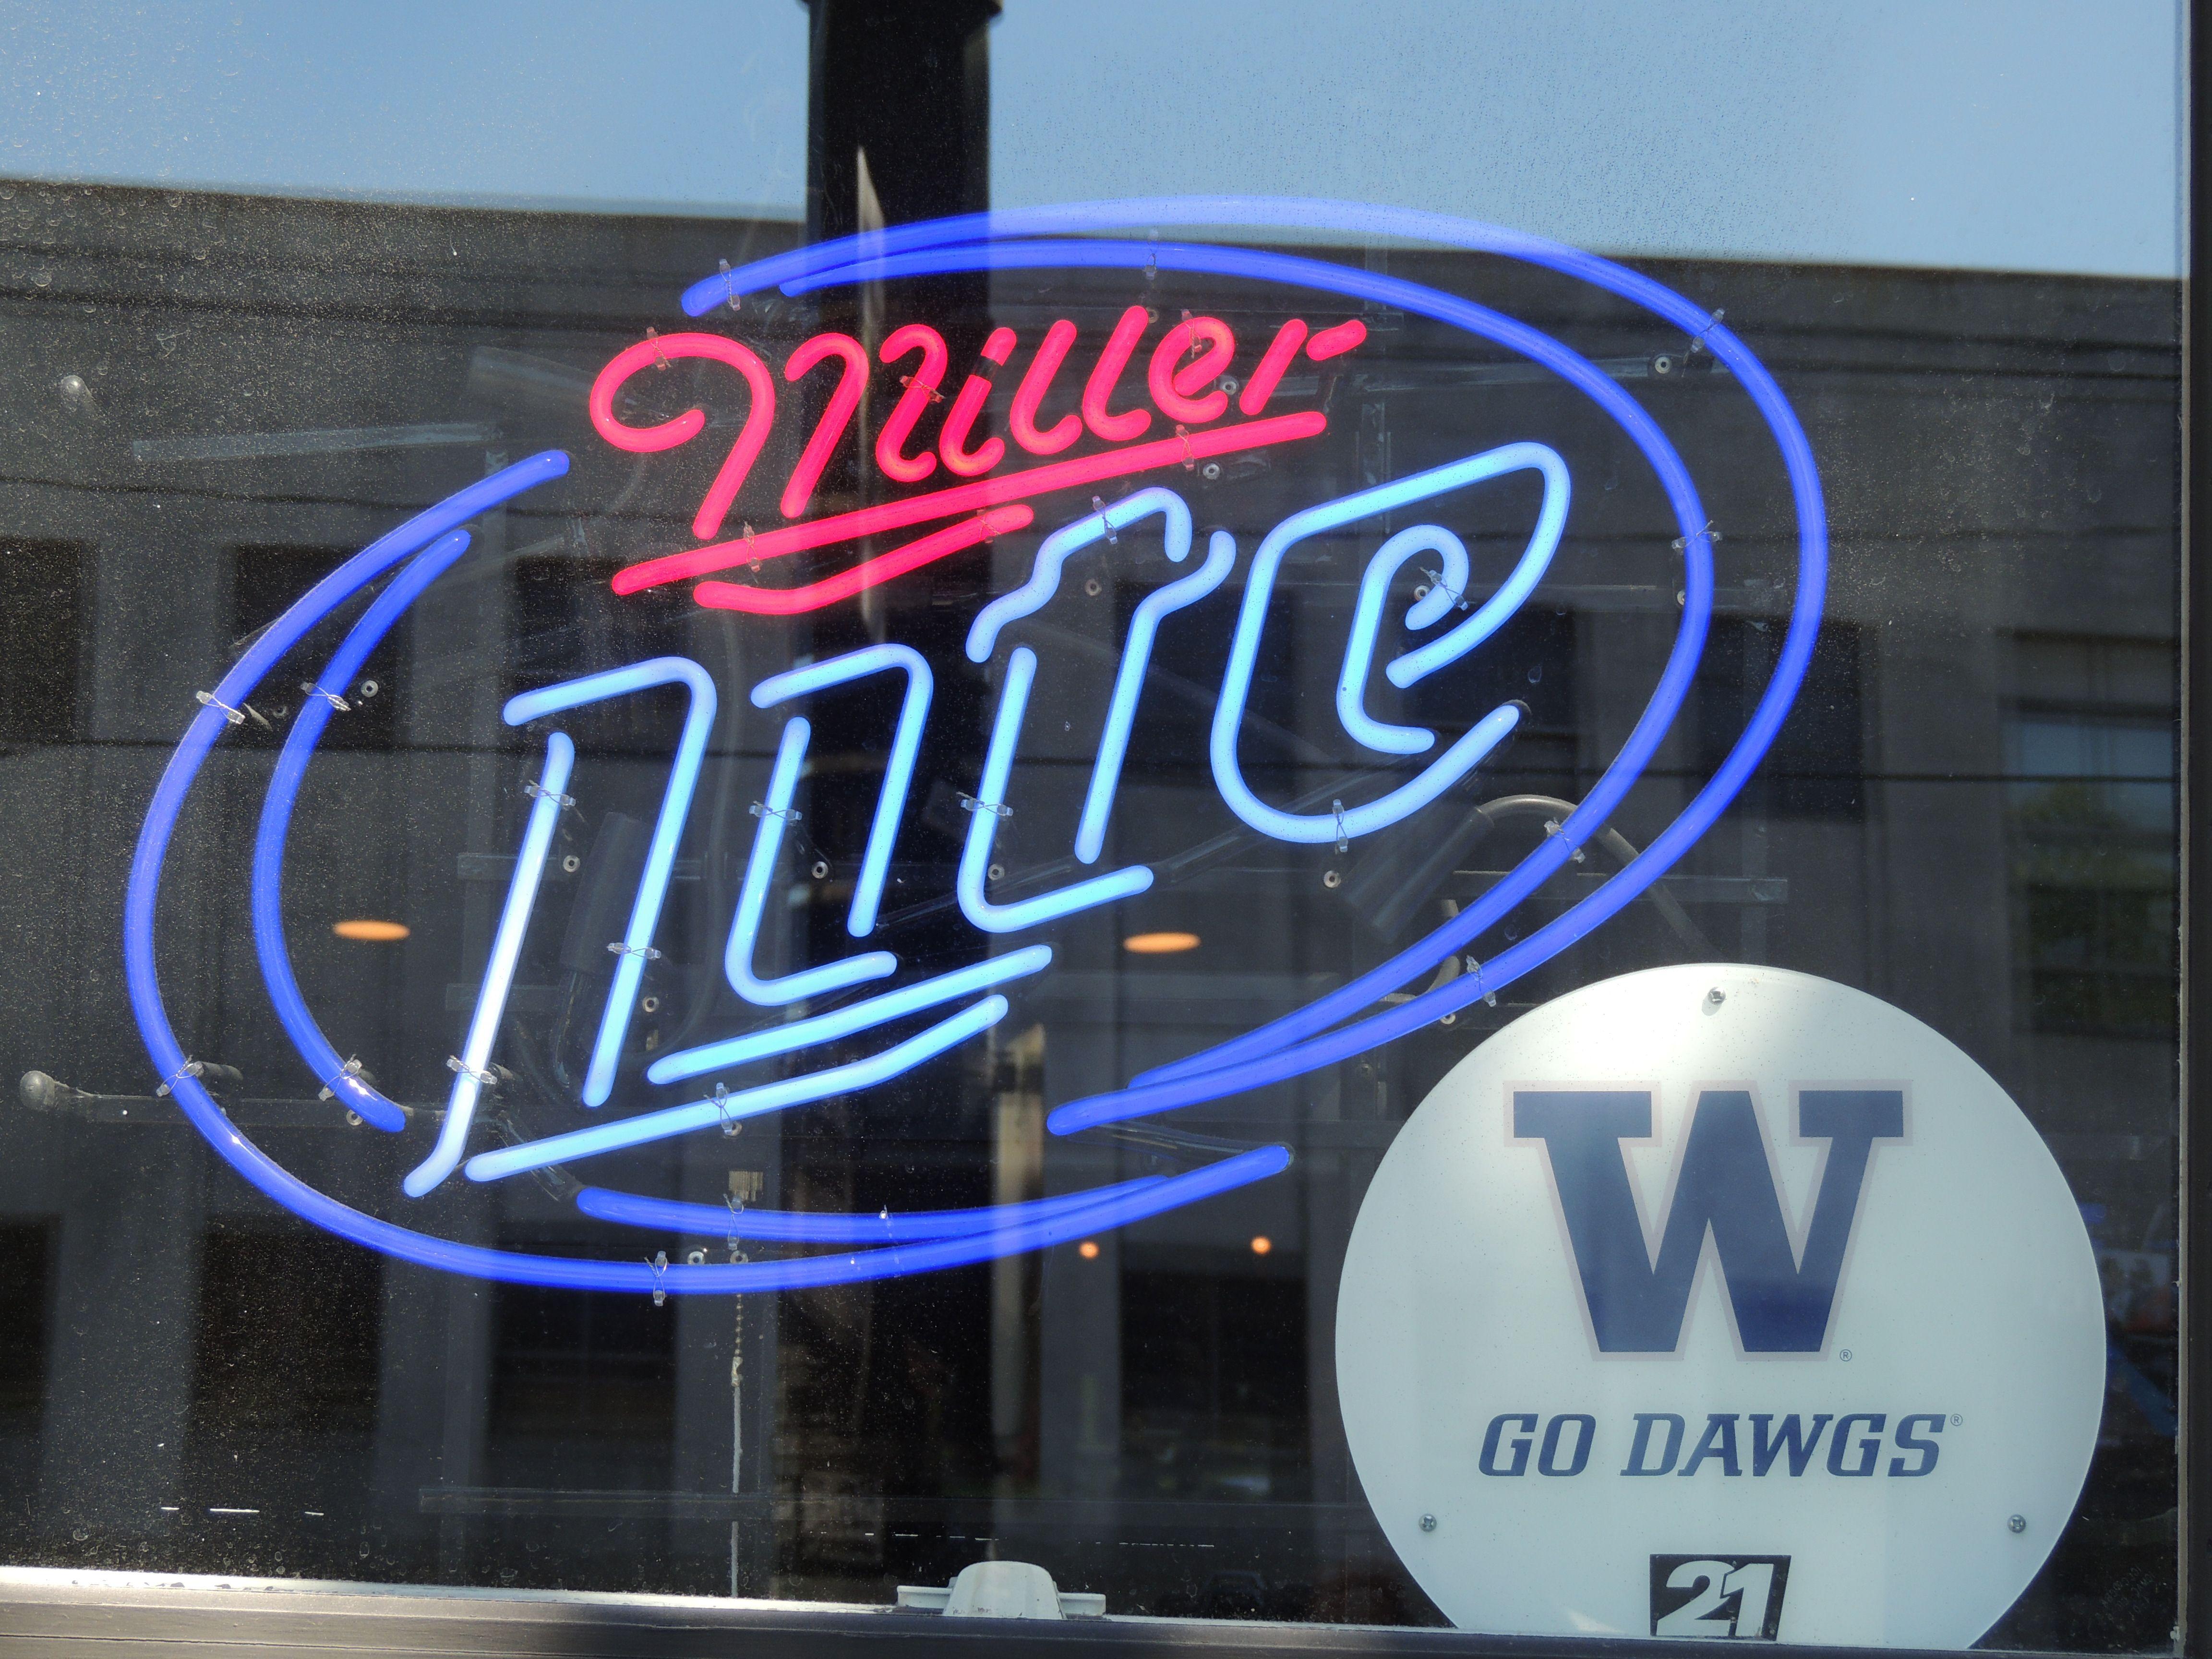 Neon Beer Sign - Miller Lite Dawgs Washington